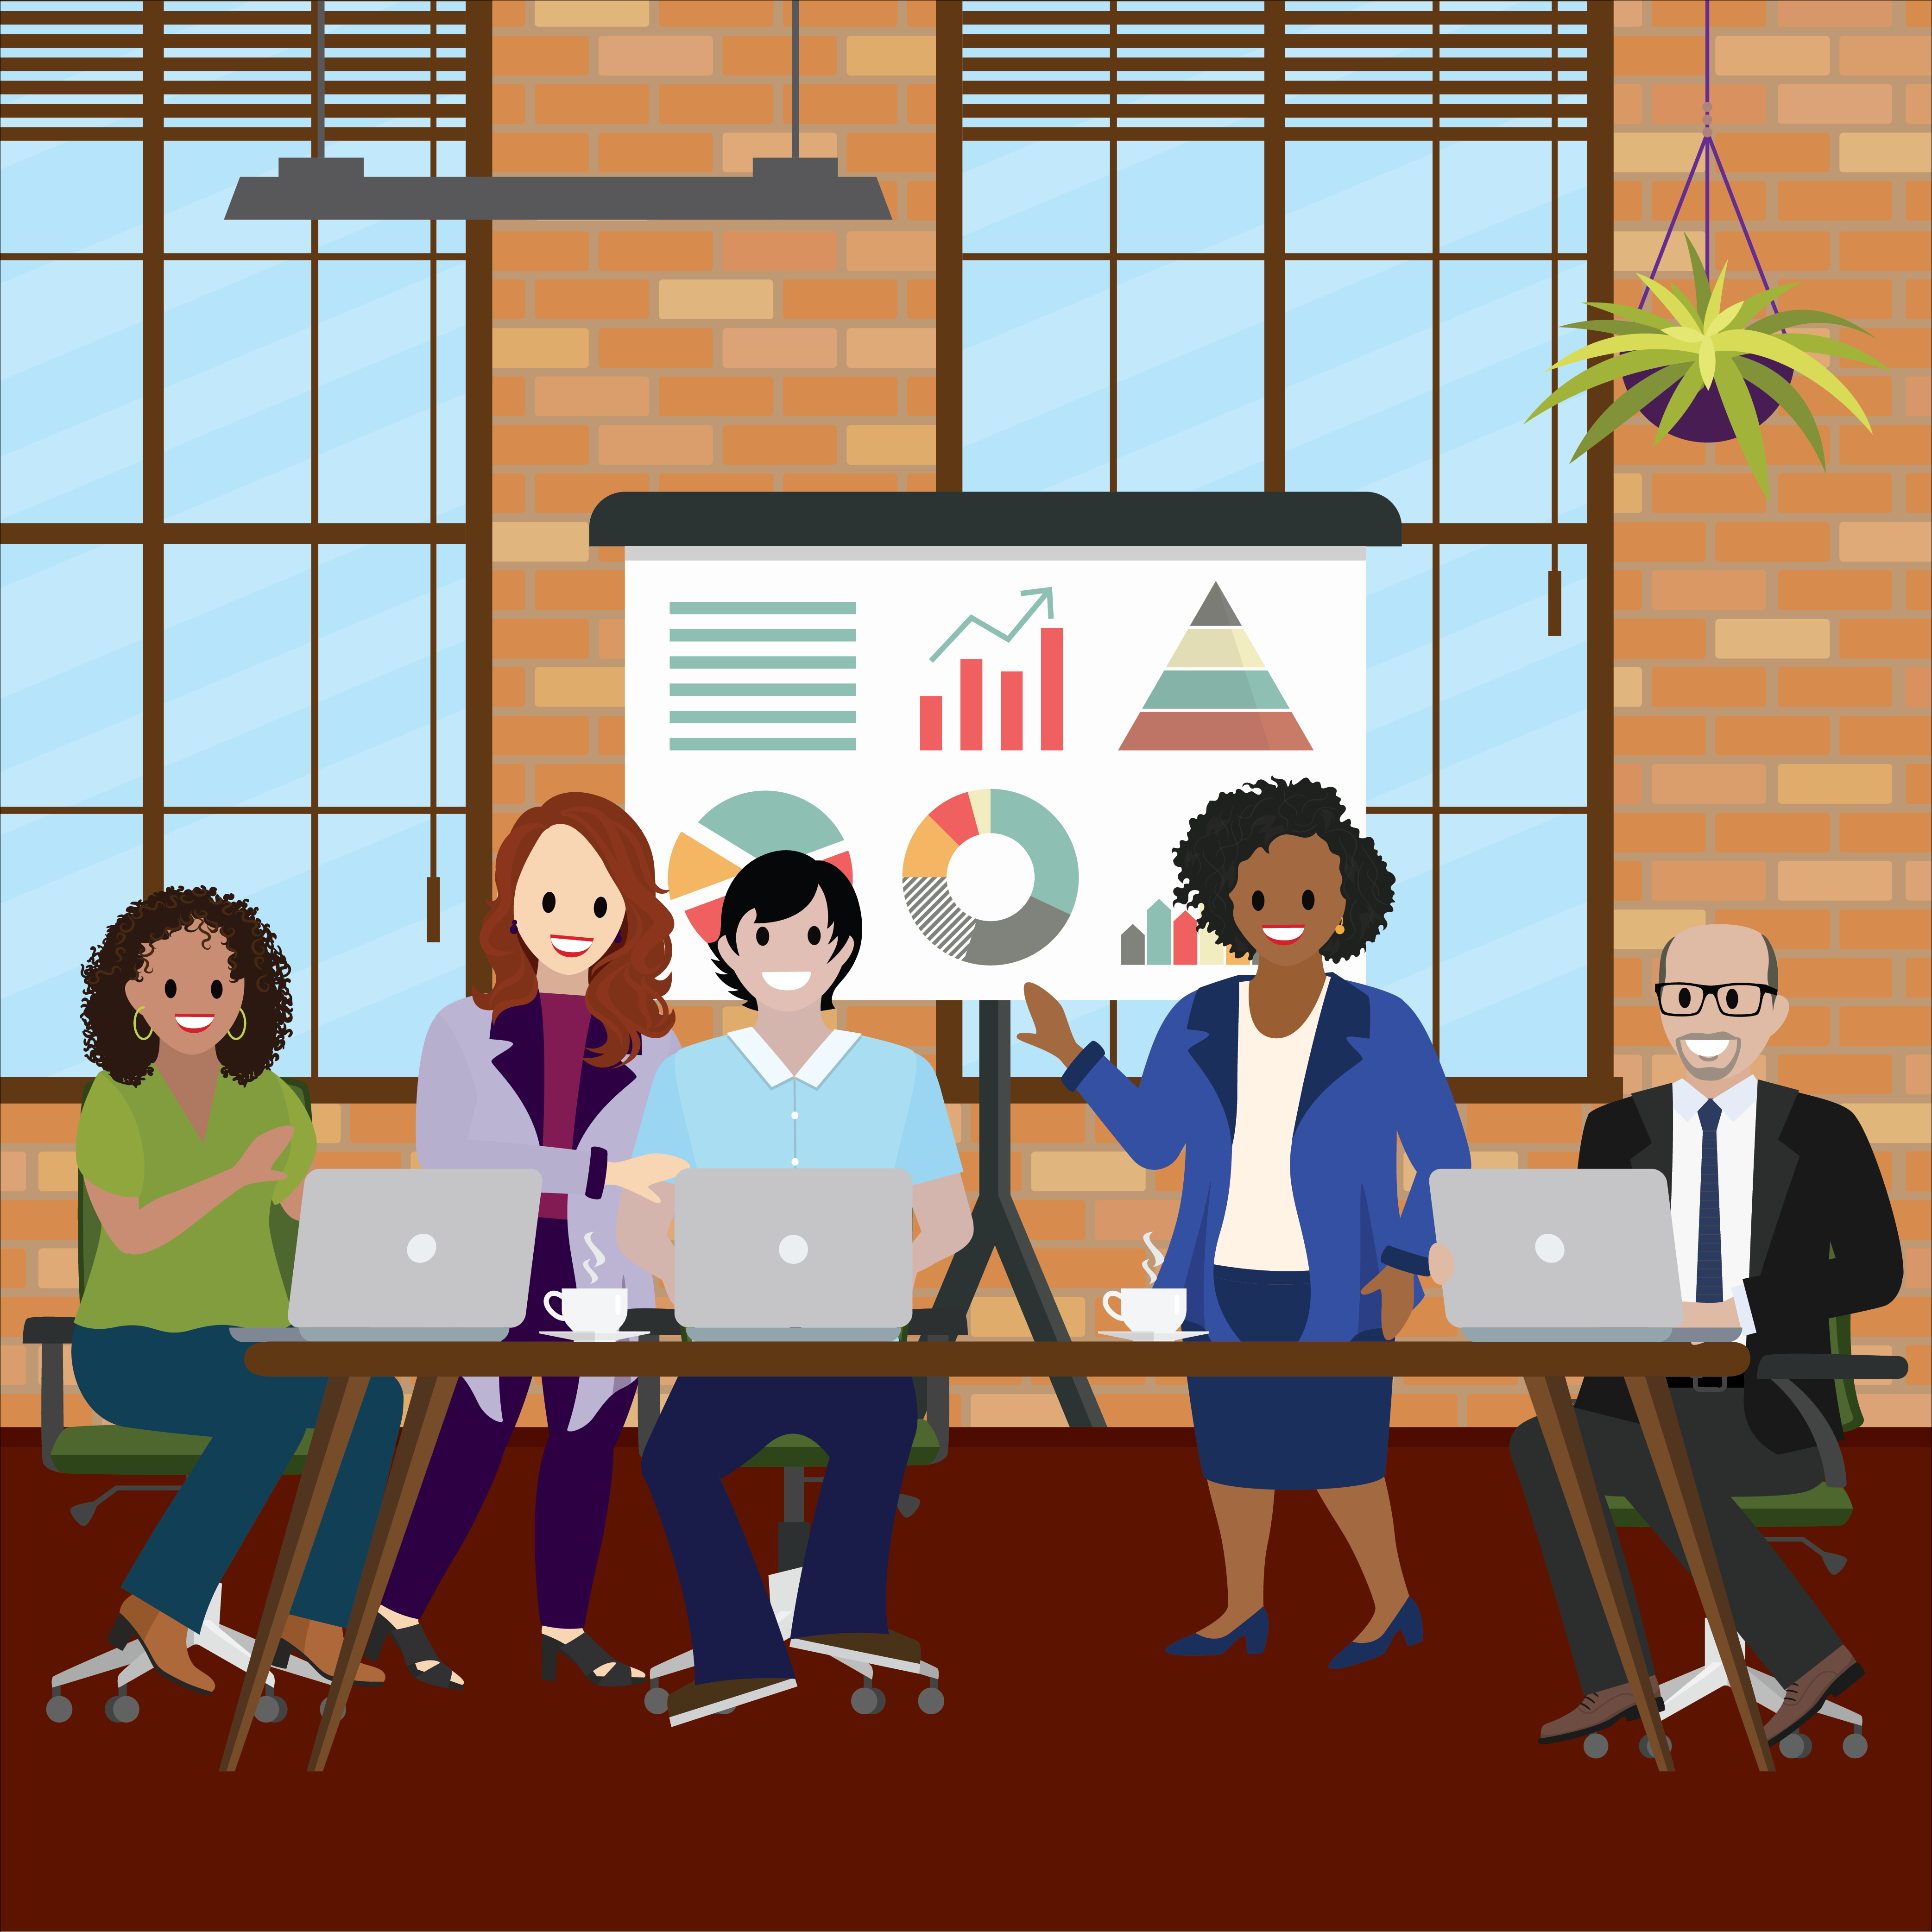 Cloudy Salesforce admin Nina Brown hosts an Advisor Link training. Valerie Keckler assists her fellow advisors.